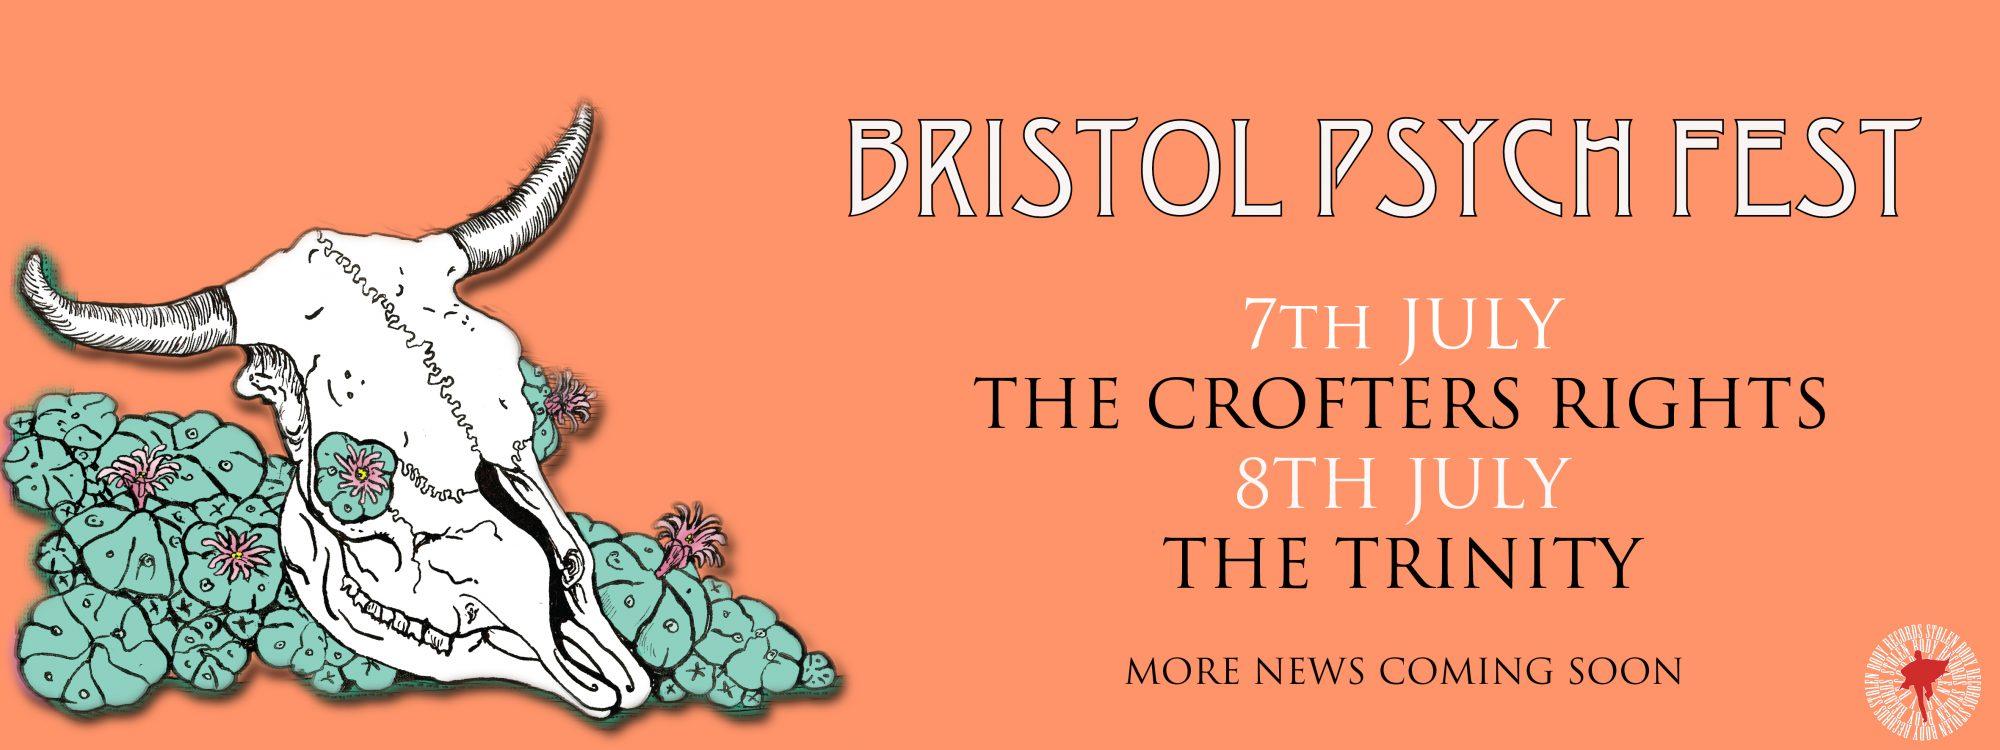 bristol-psych-fest-4-copy